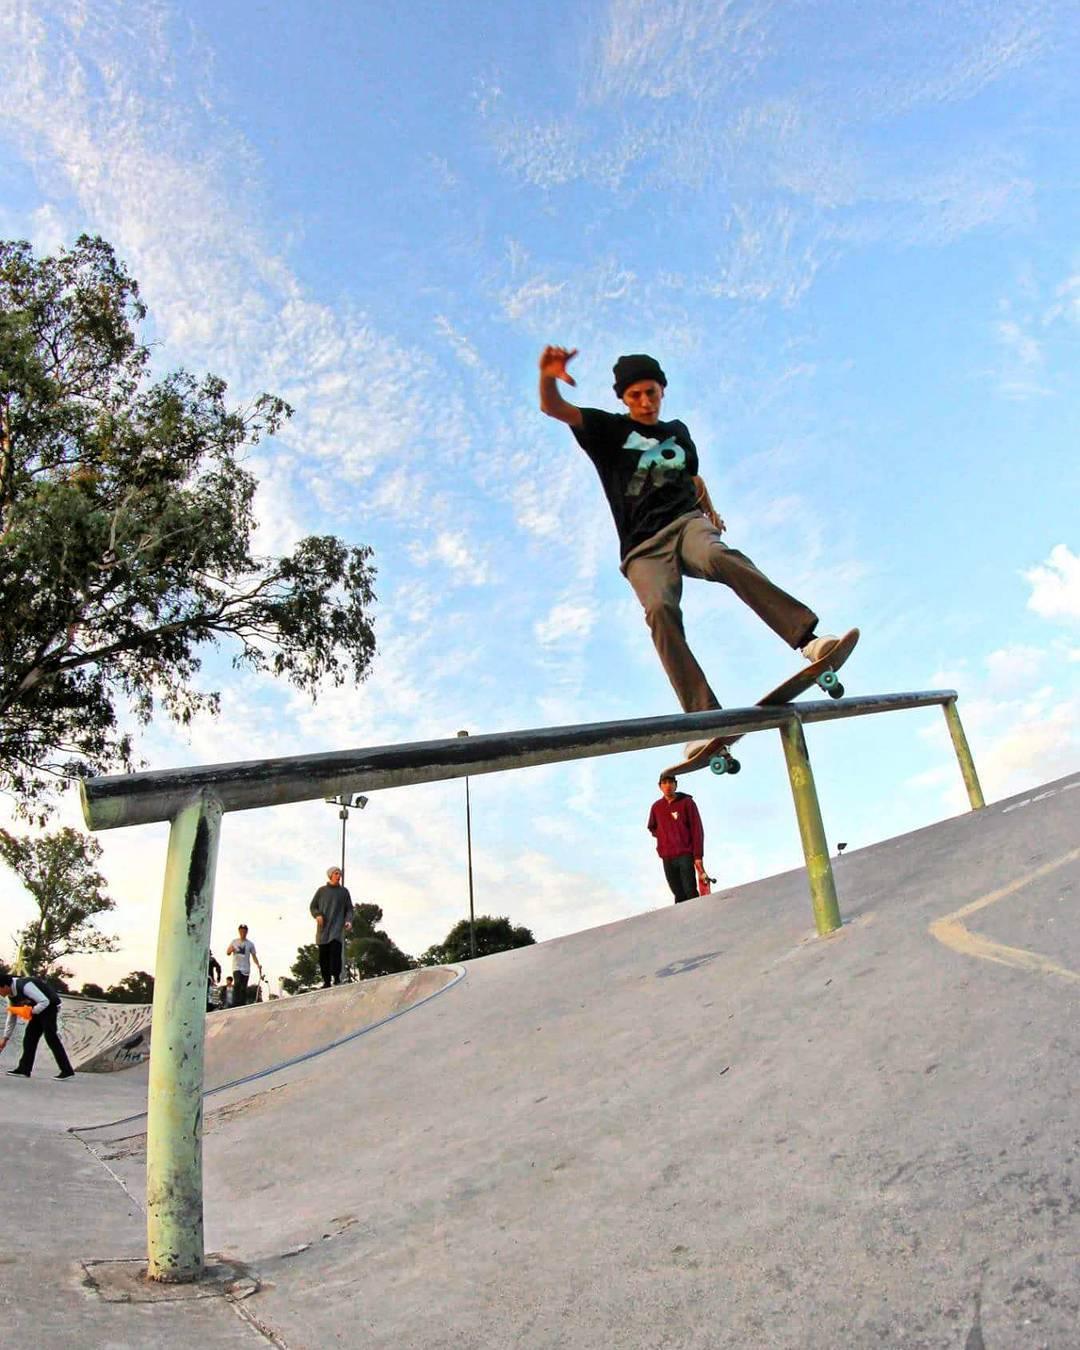 Nicolas Hernandez  Fs Lipslide Esquel - Chubut  #gotcha #iconsneverdie #skateboarding